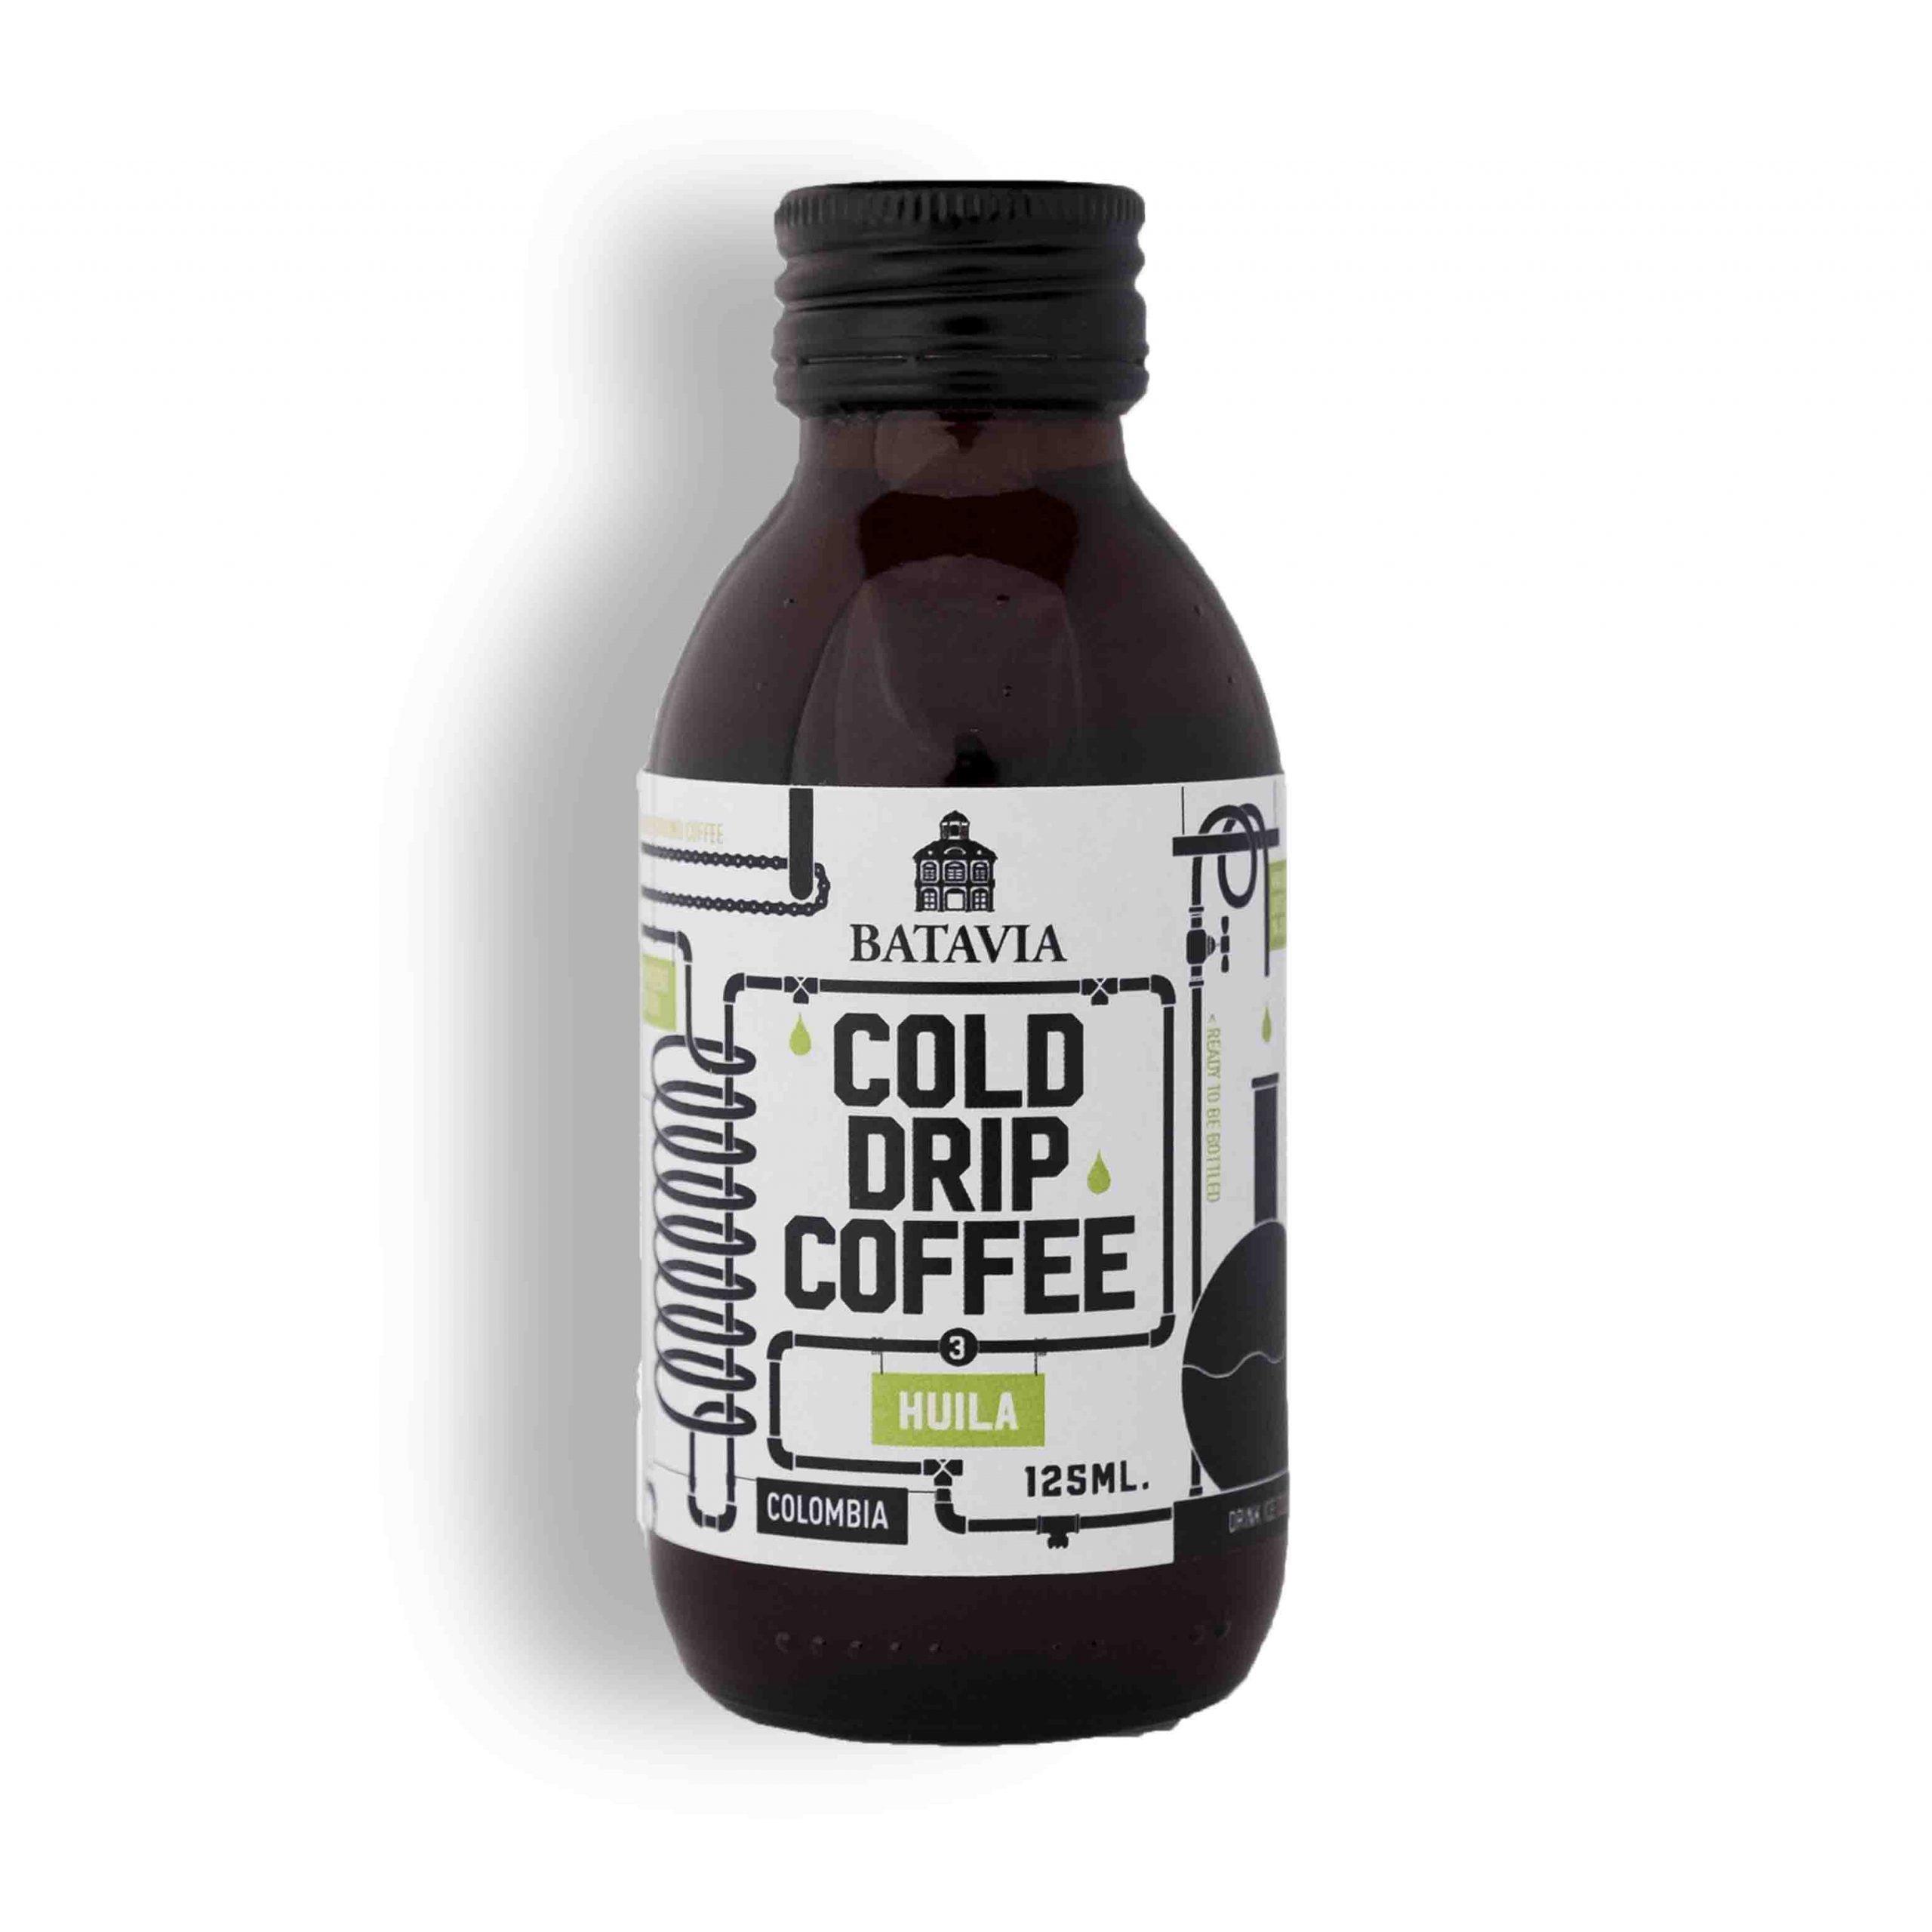 Batavia Cold Drip Coffee Huila 125